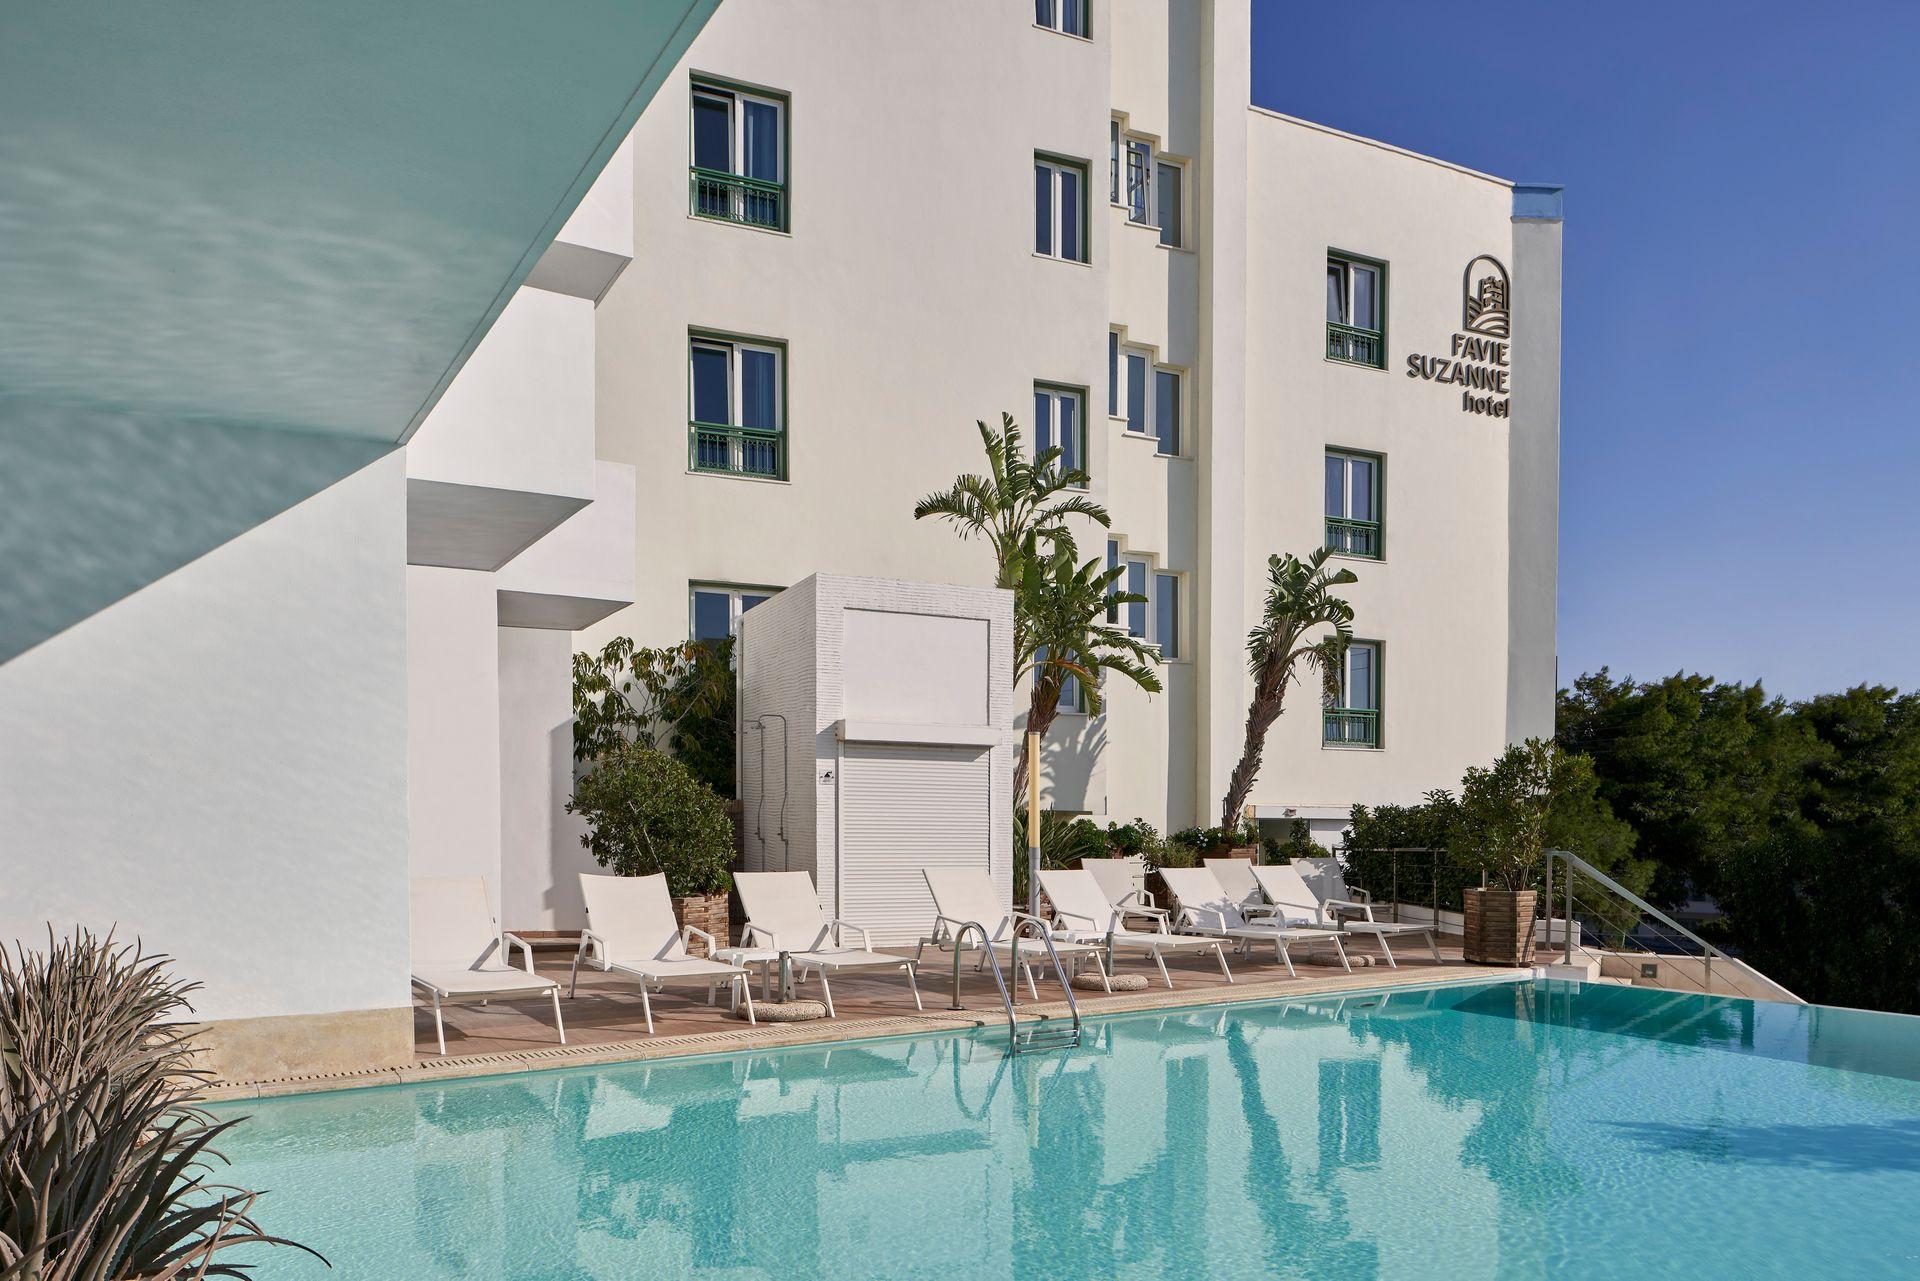 Favie Suzanne Hotel Tinos - Τήνος ✦ -33% ✦ 4 Ημέρες